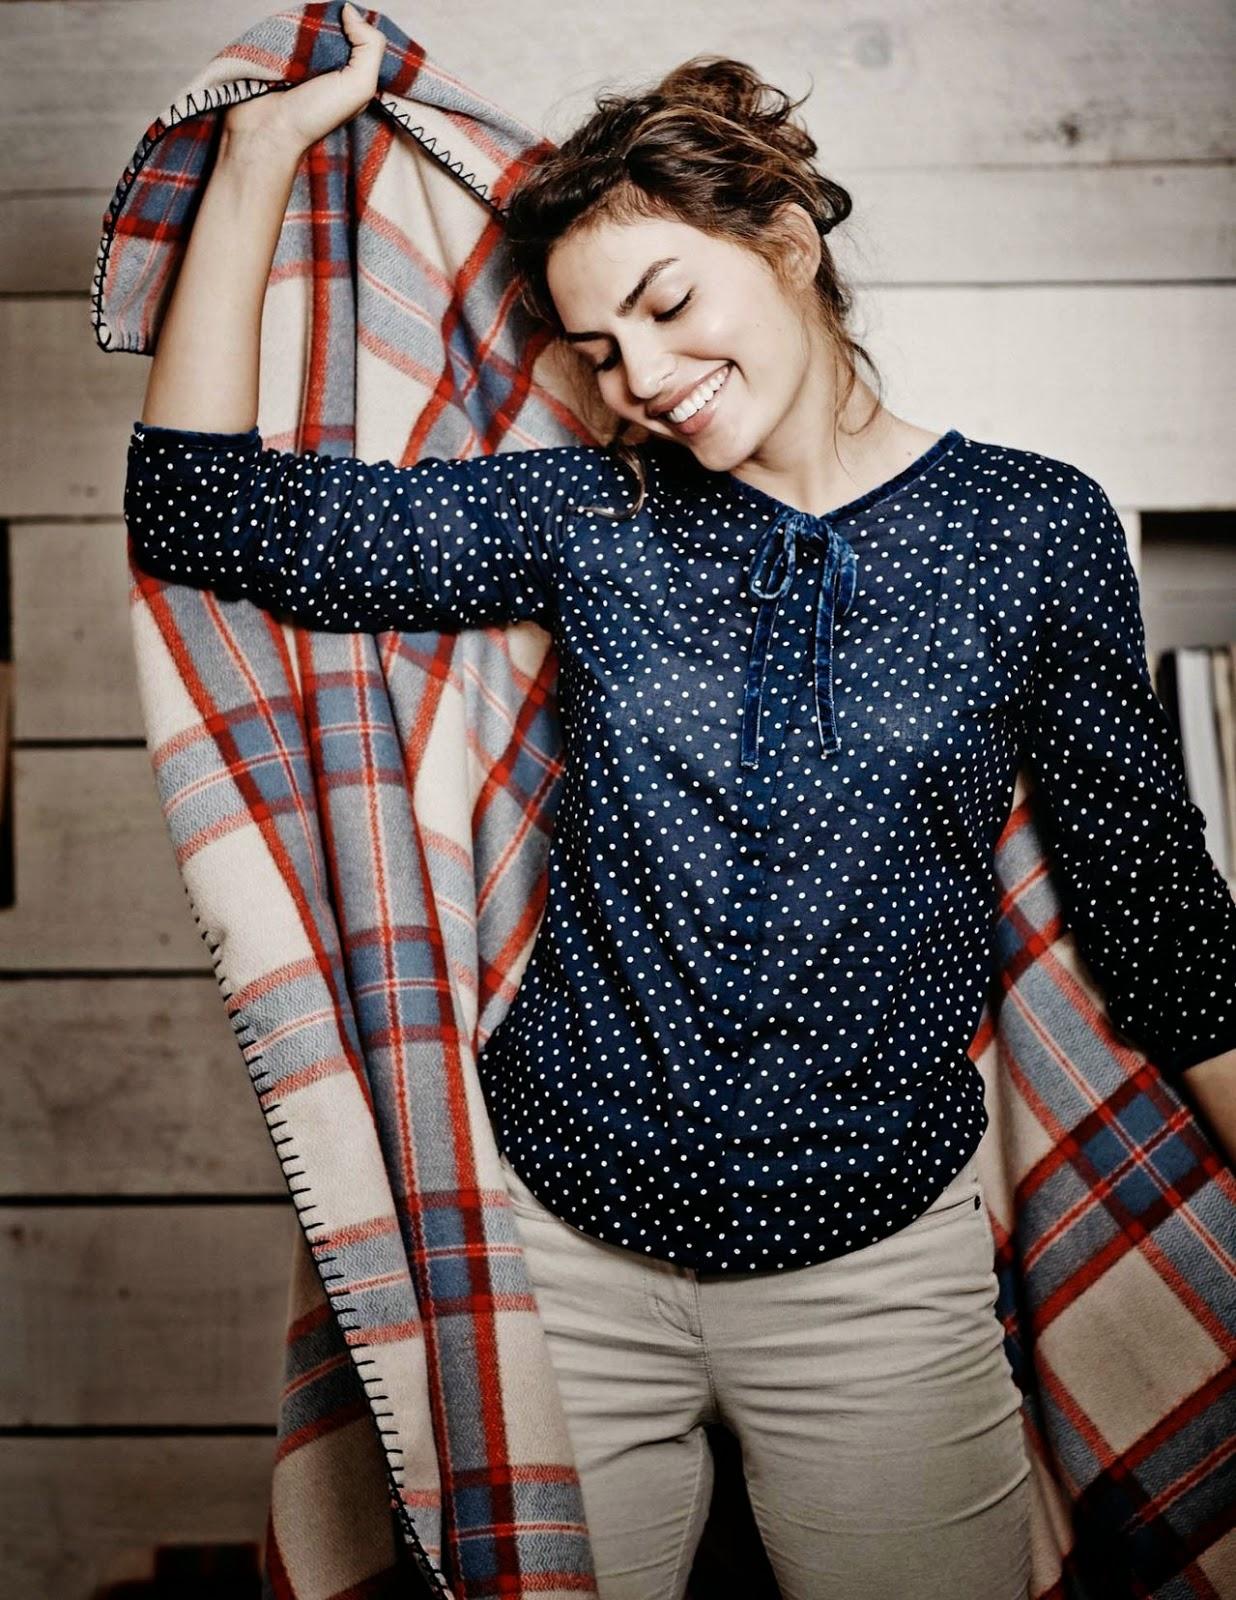 Fashion gossip boden winter 2014 preview model alyssa for Boden preview autumn 2015